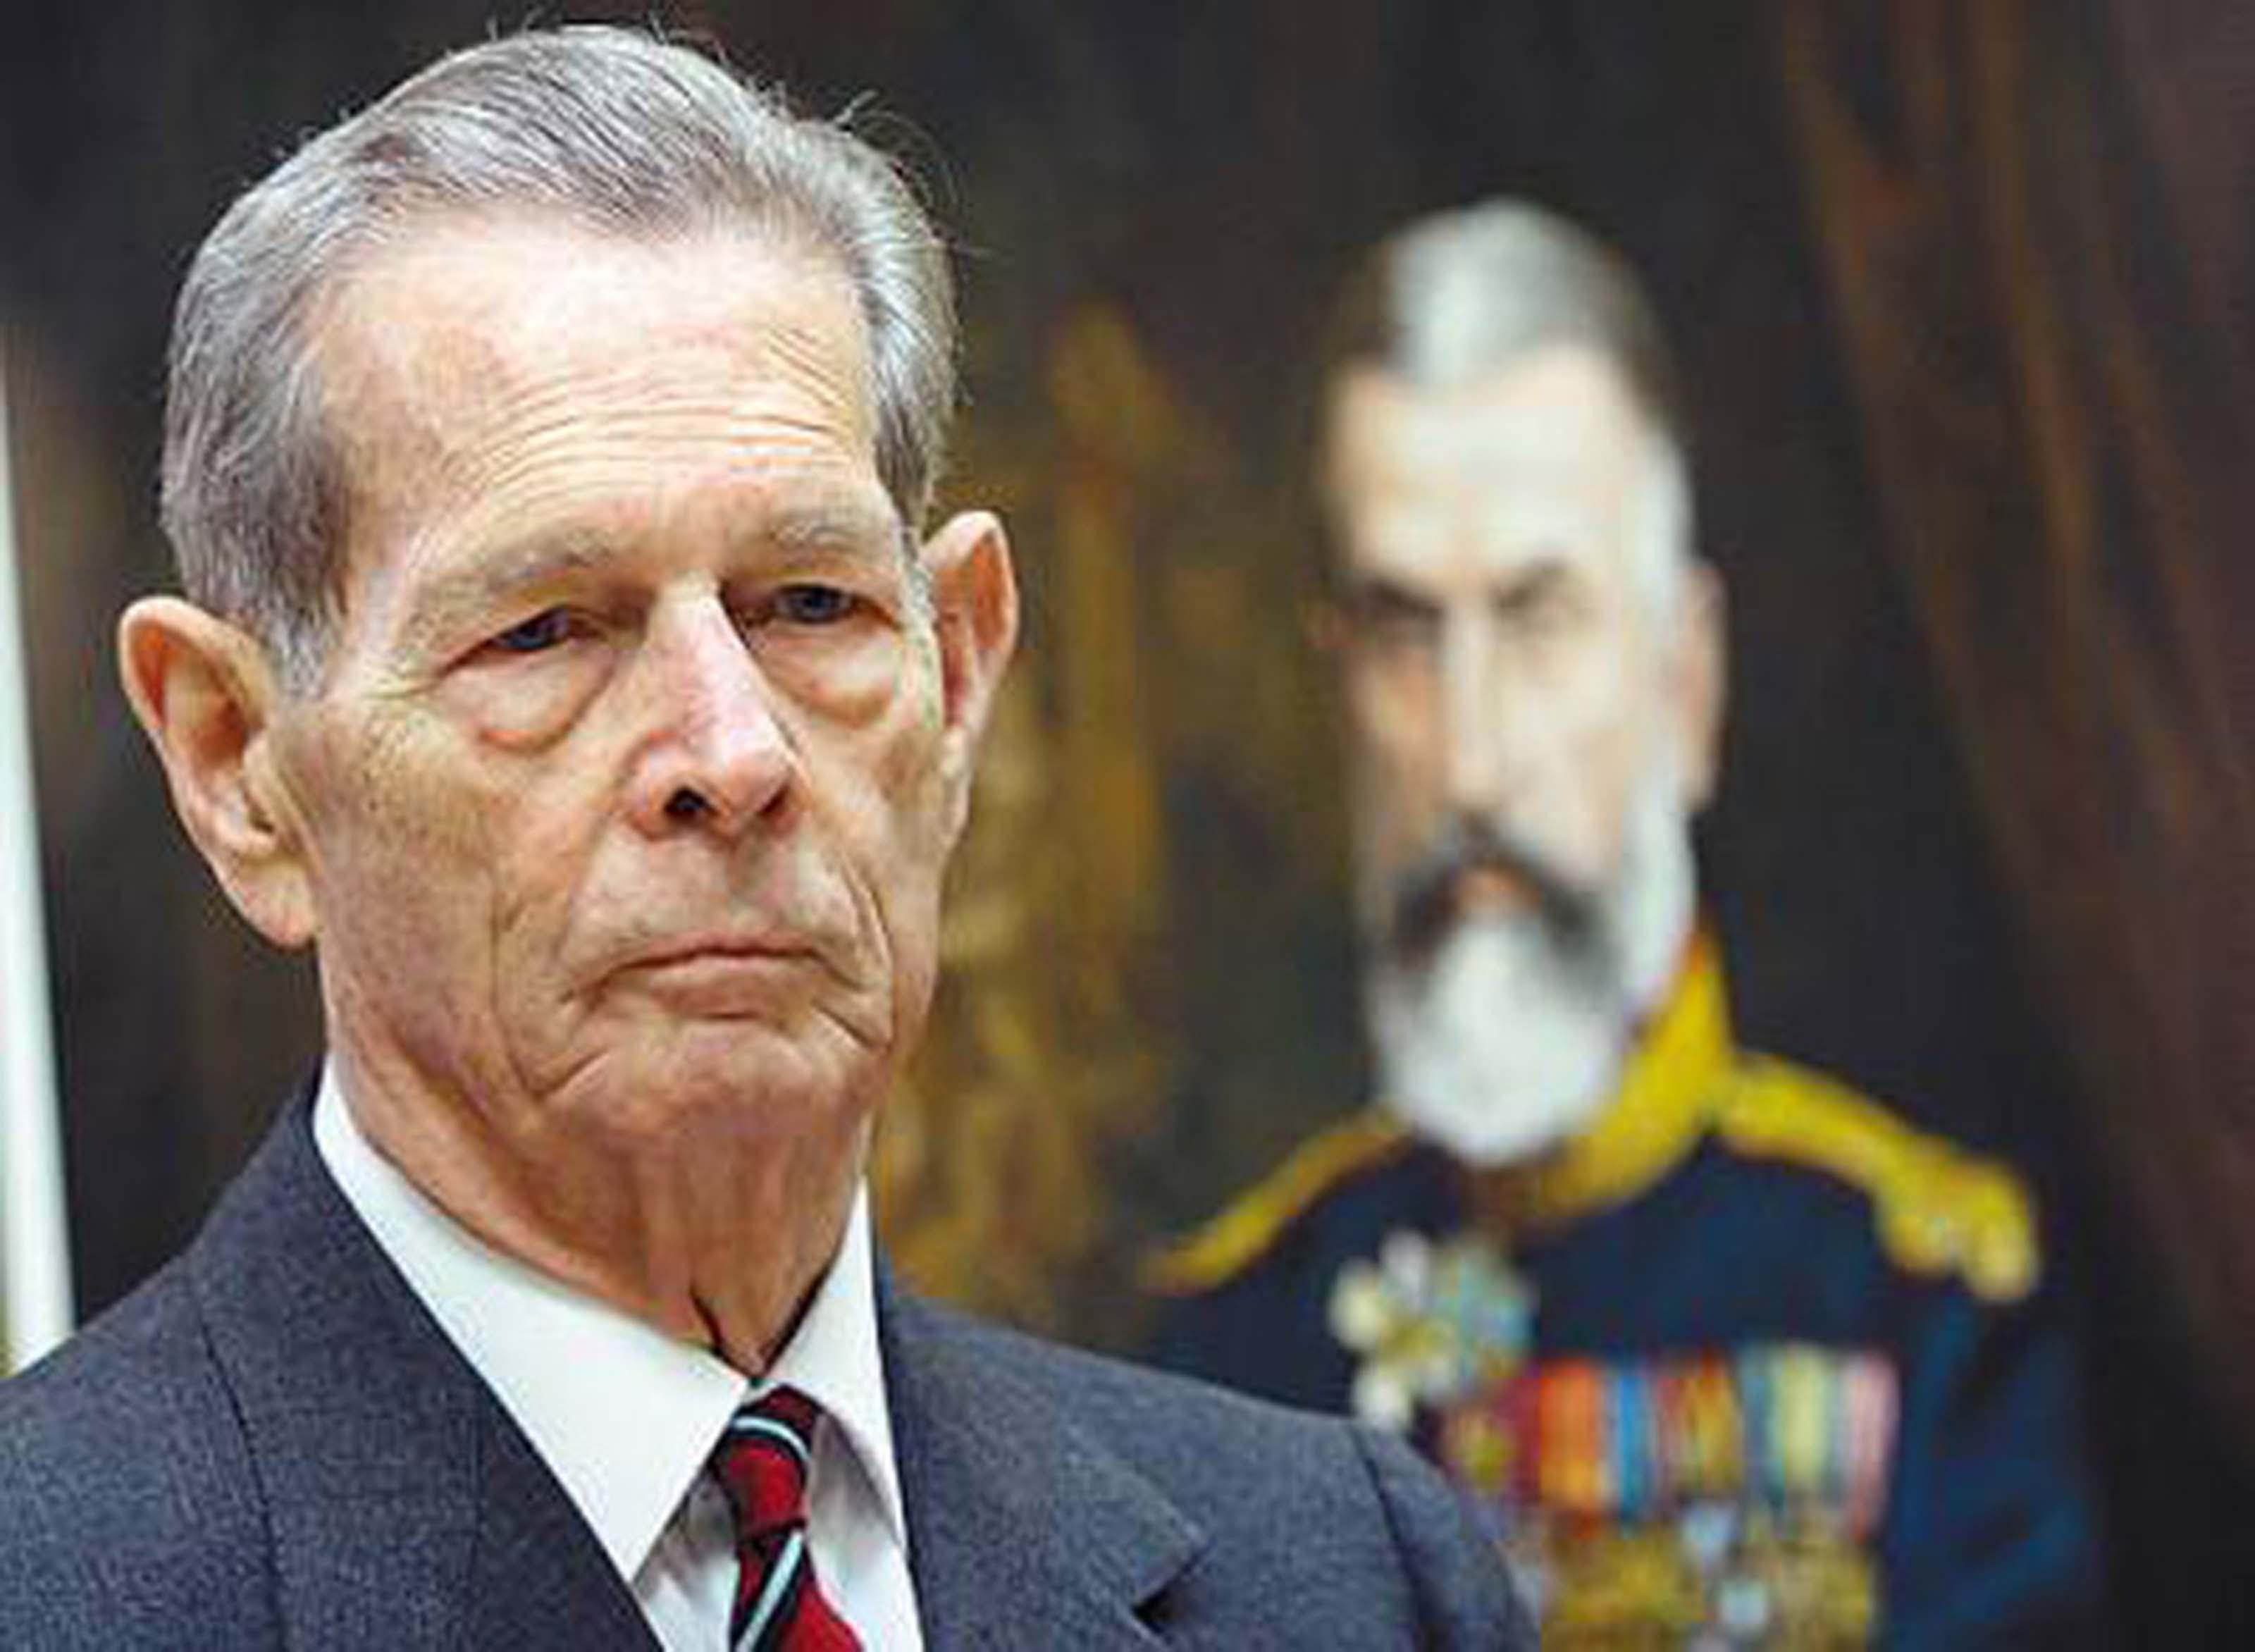 Nicolae Timofti transmite un mesaj de susținere Regelui Mihai I al României